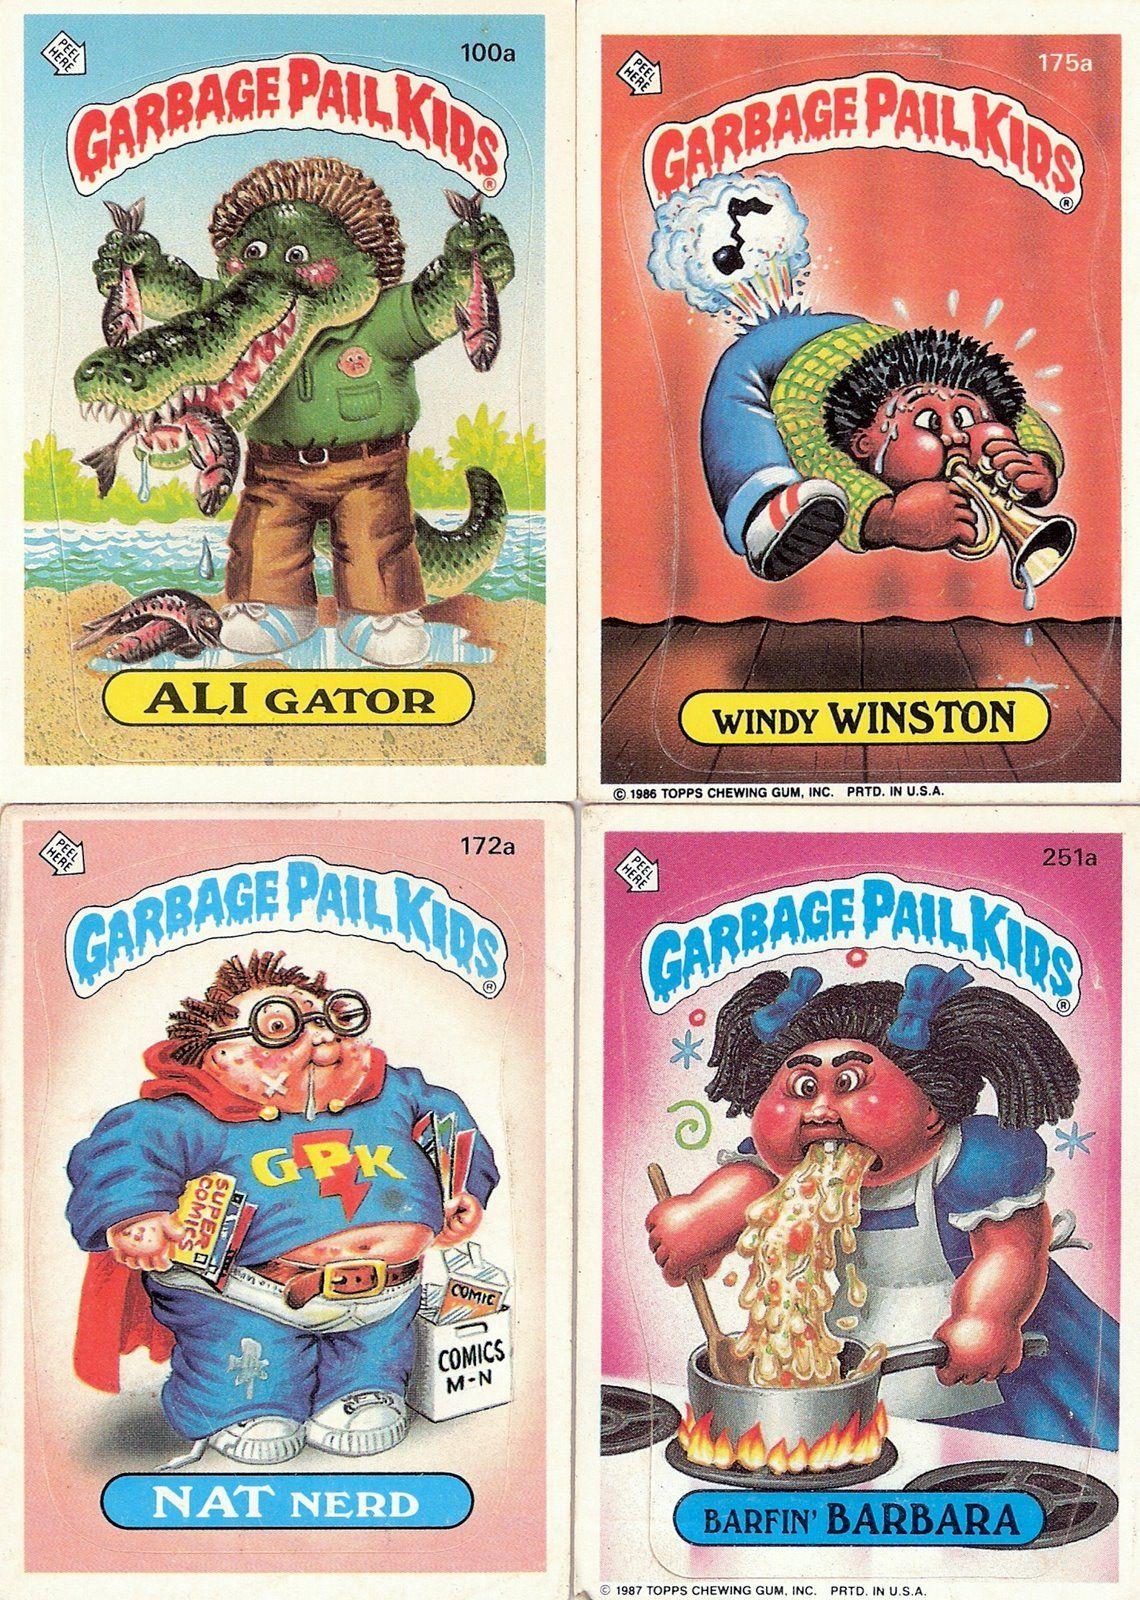 Garbagepailkids Garbage Pail Kids Garbage Pail Kids Cards Childhood Memories